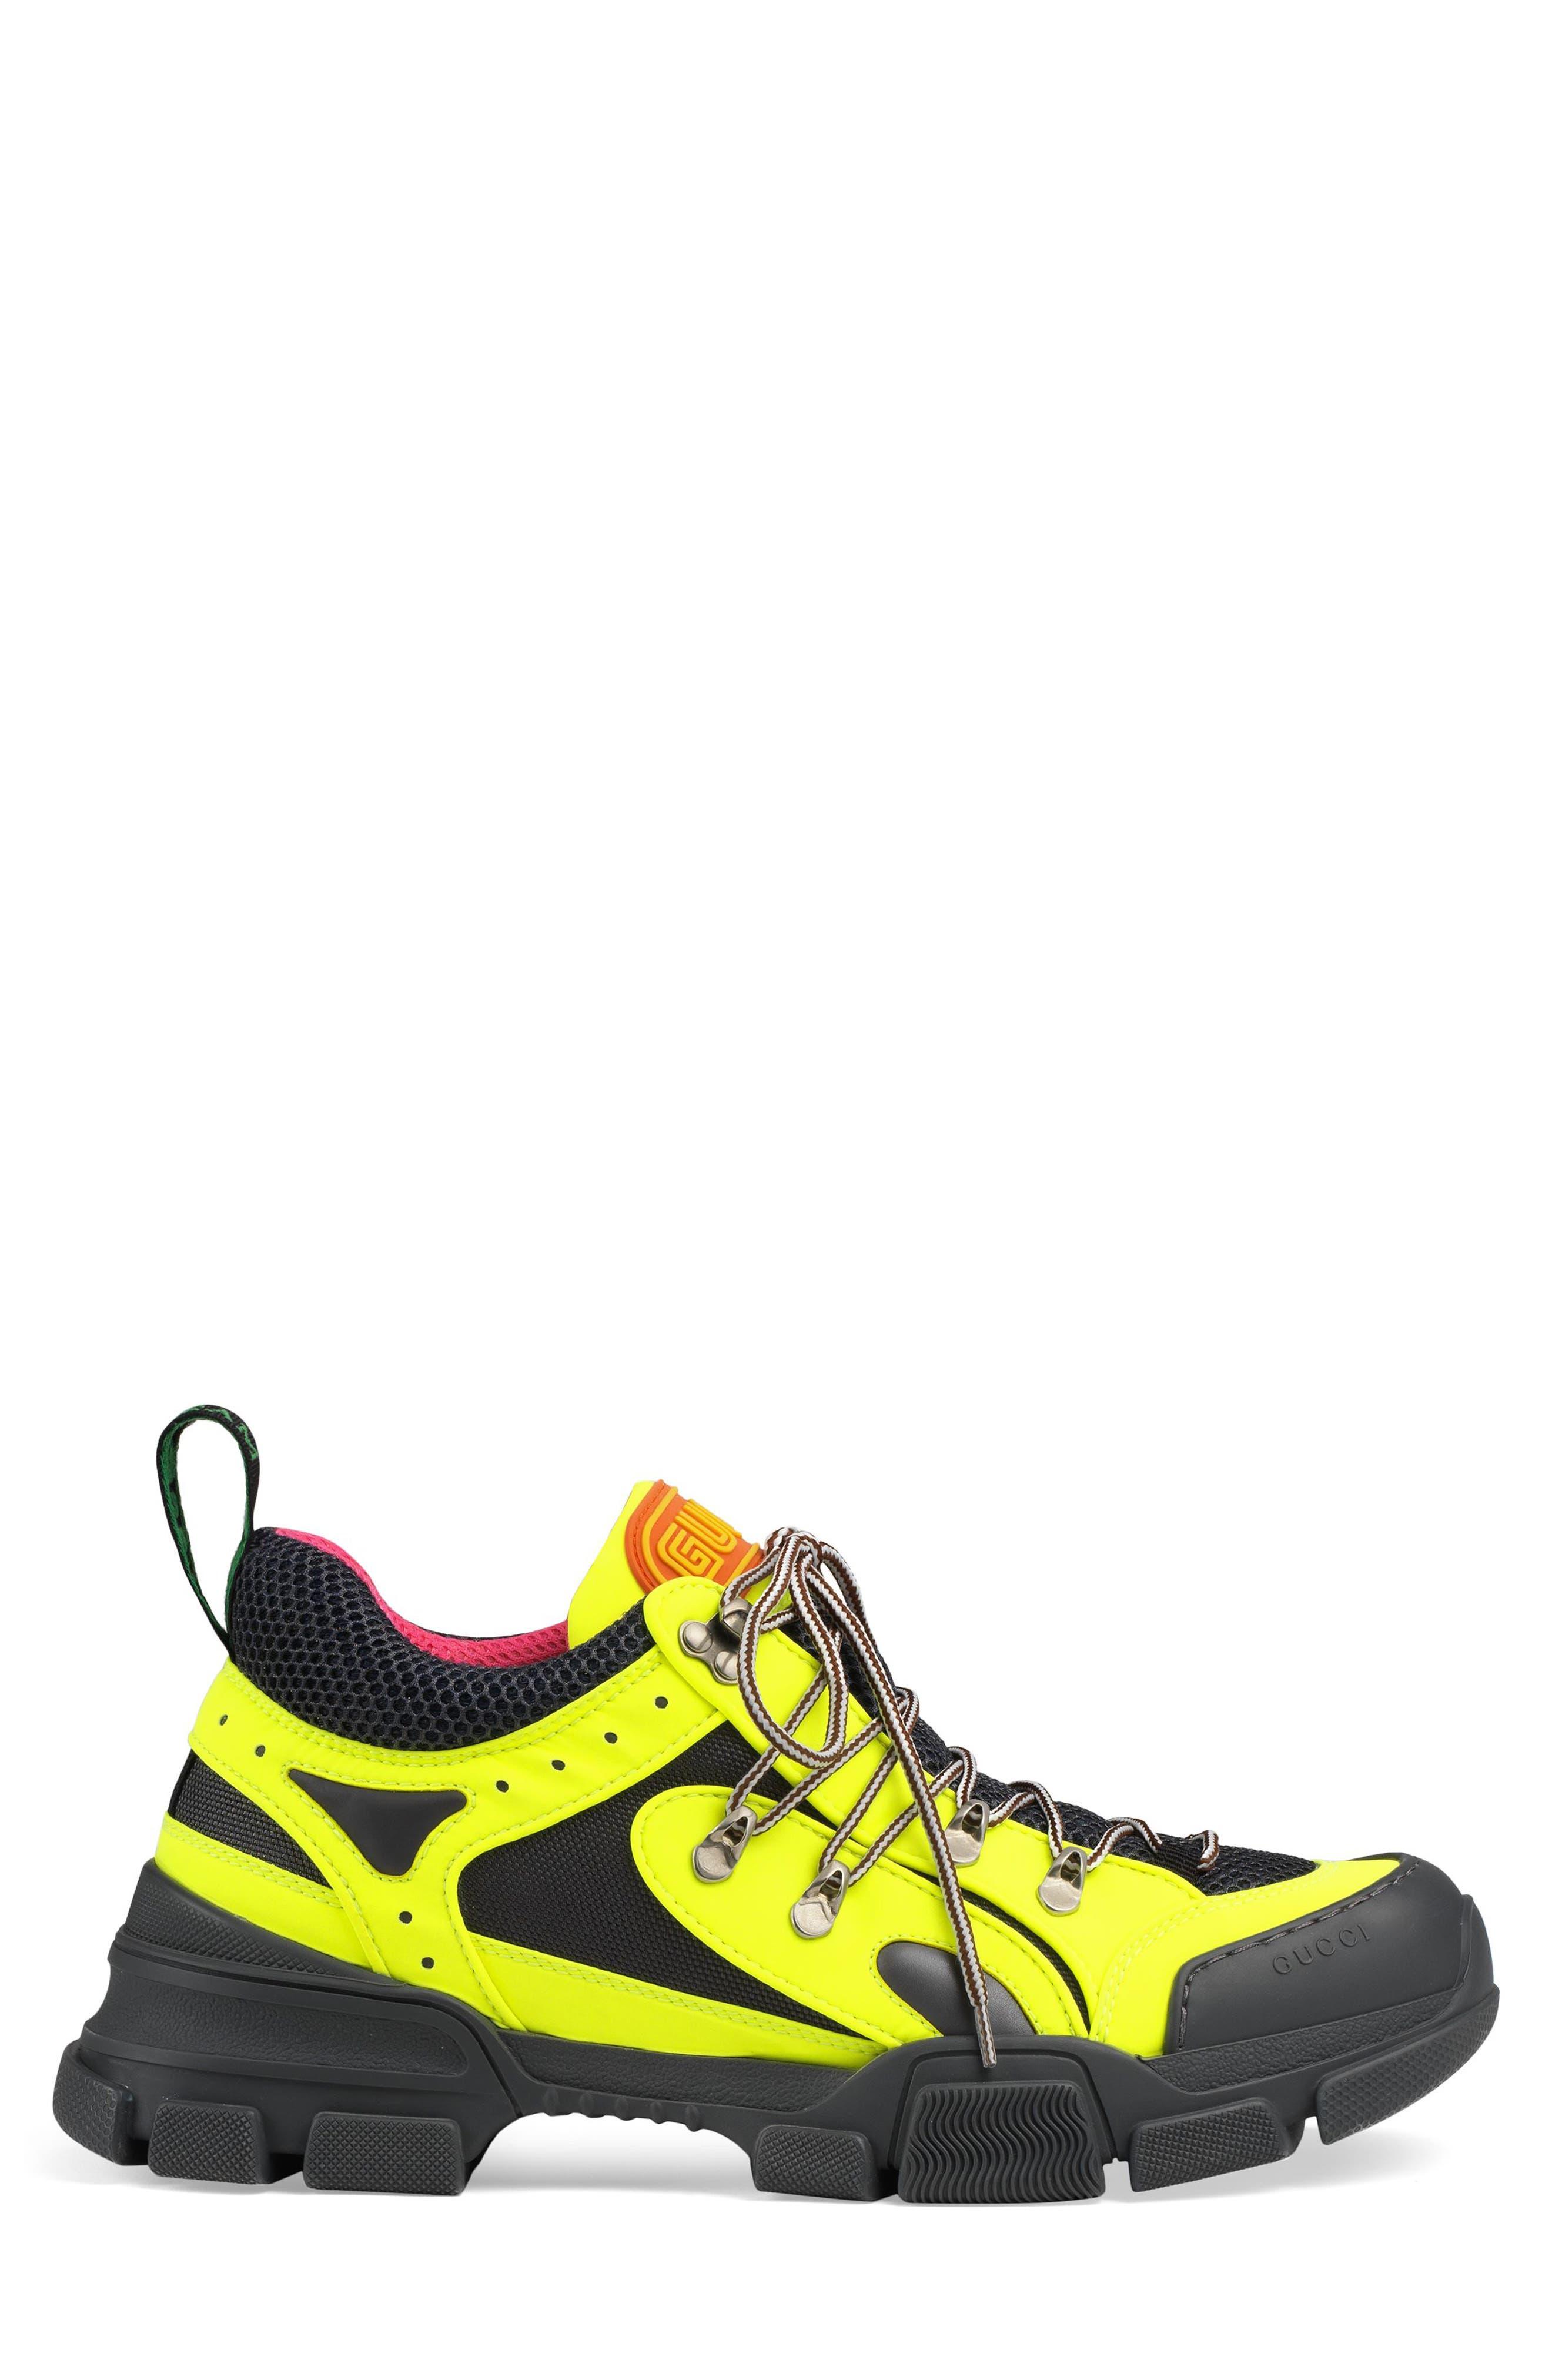 Flashtrek Sneaker,                             Alternate thumbnail 2, color,                             YELLOW